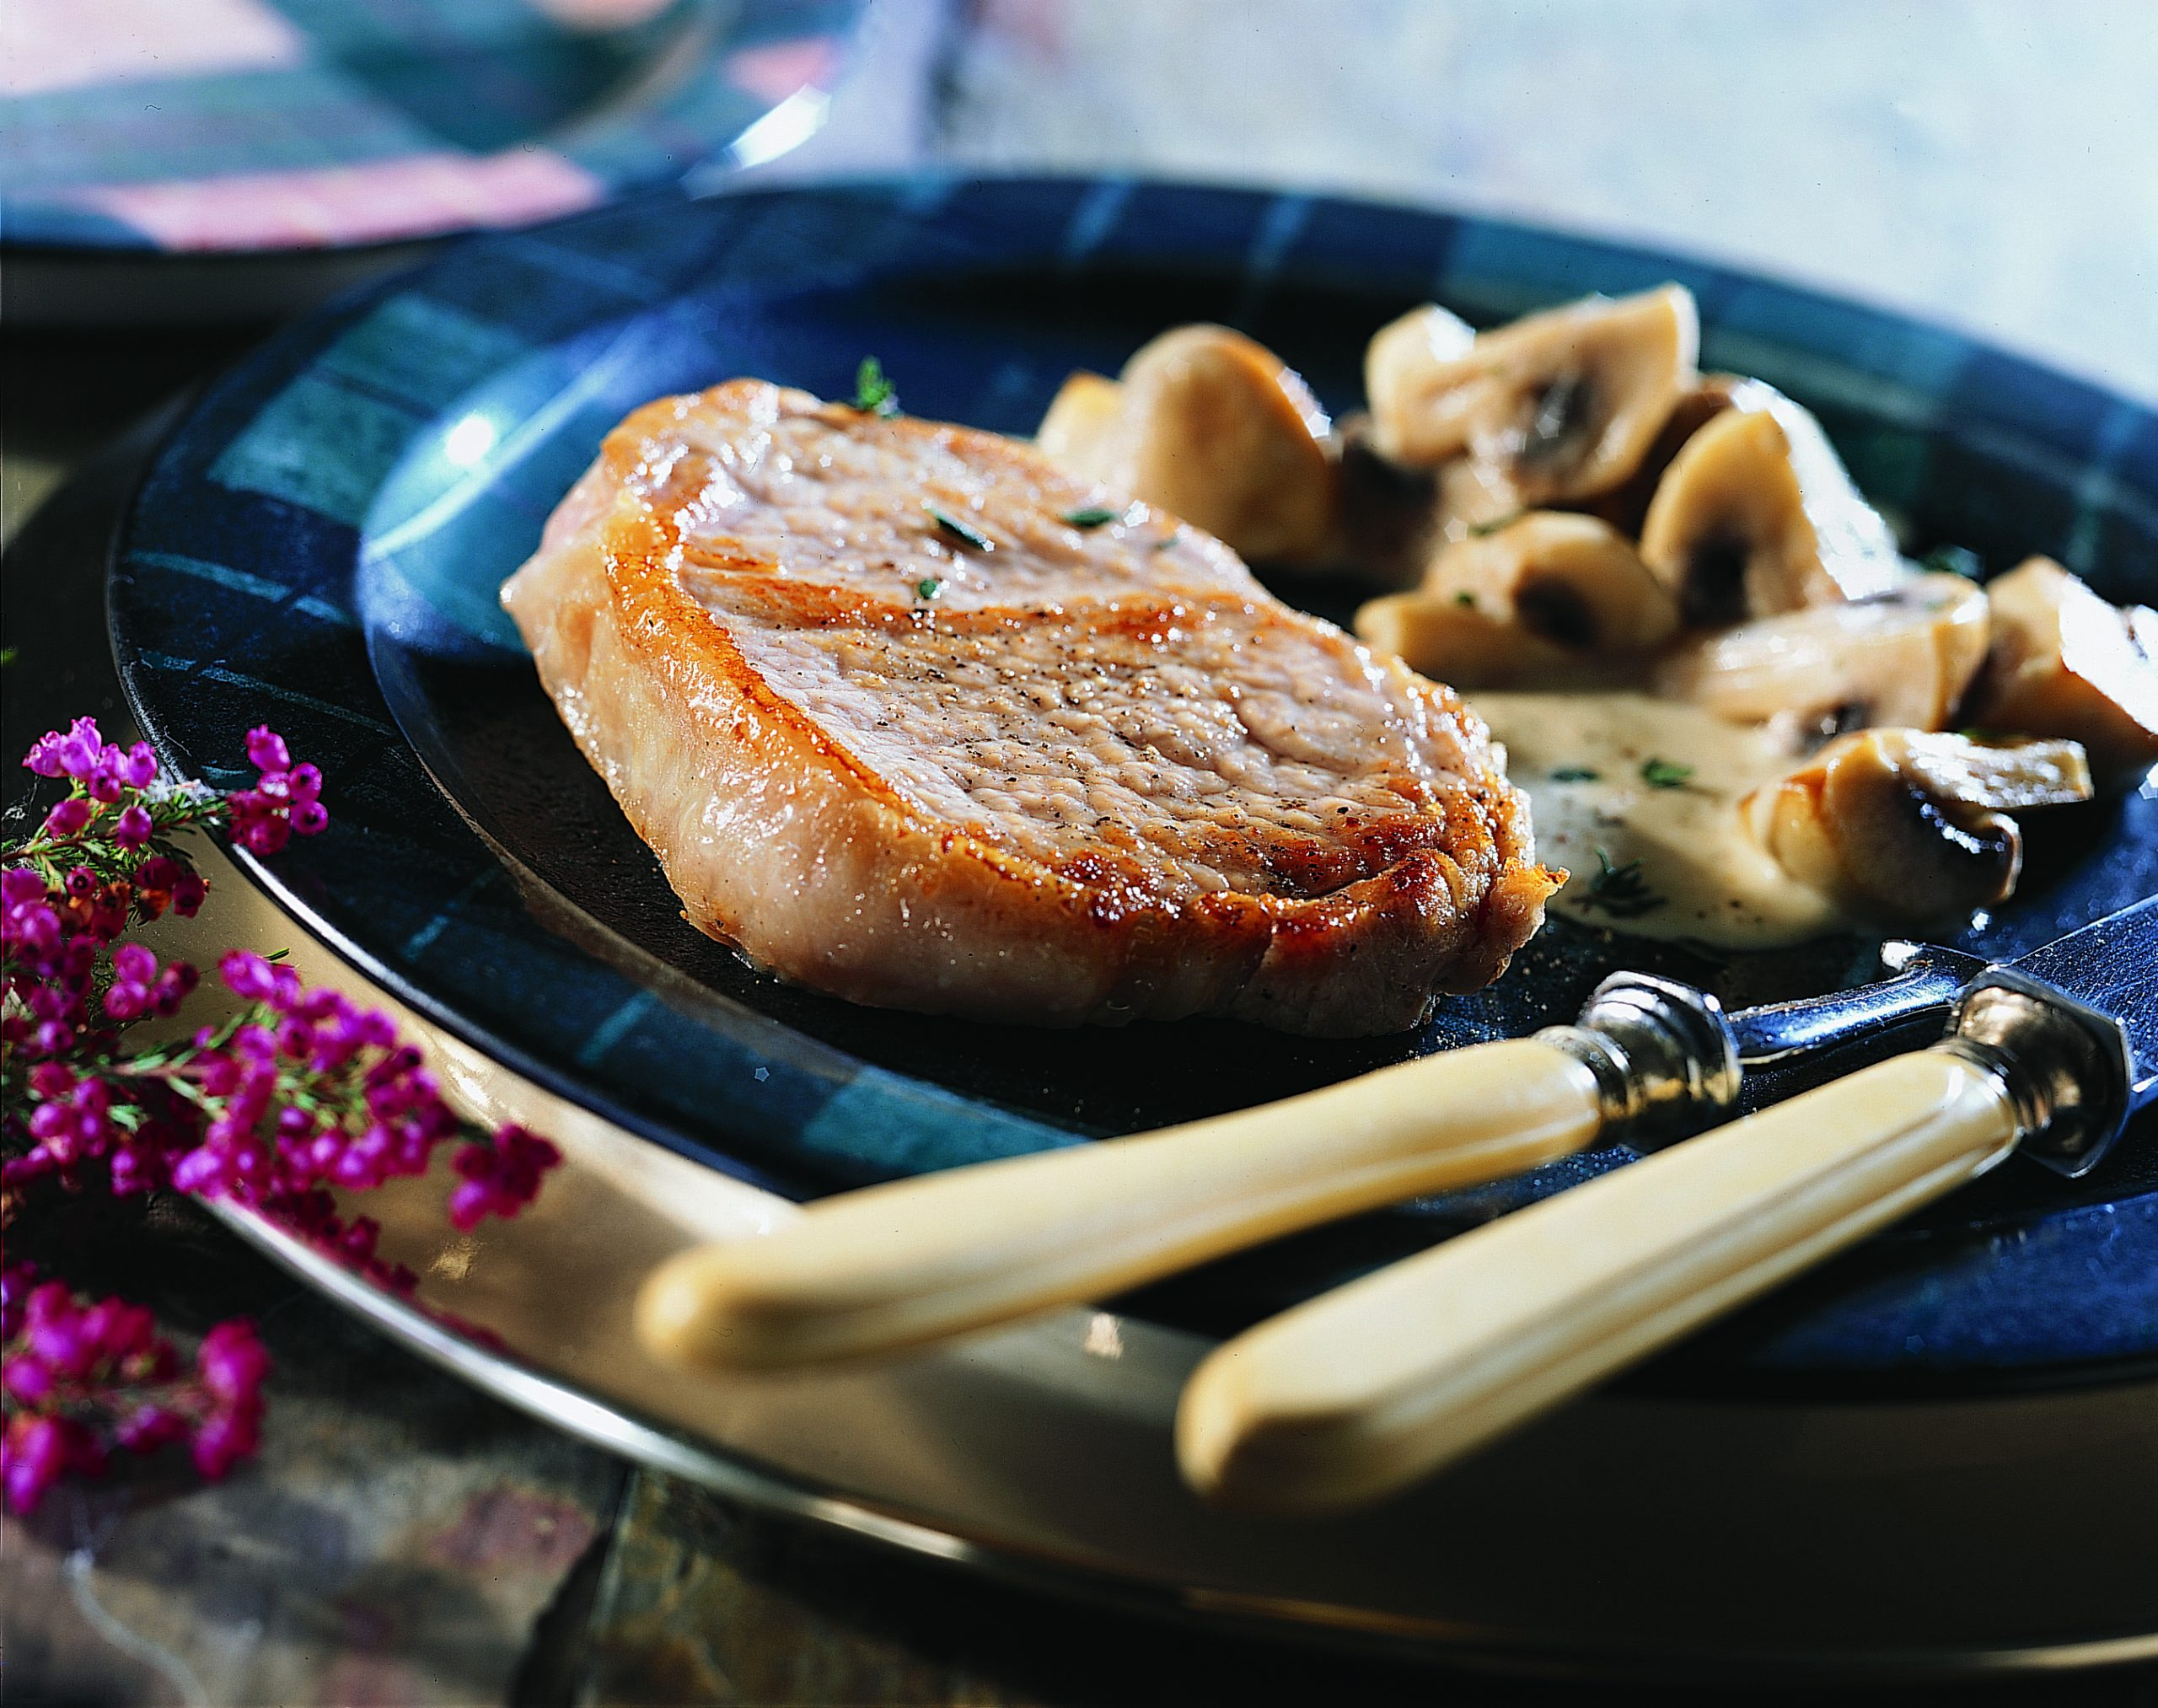 Steak balmoral